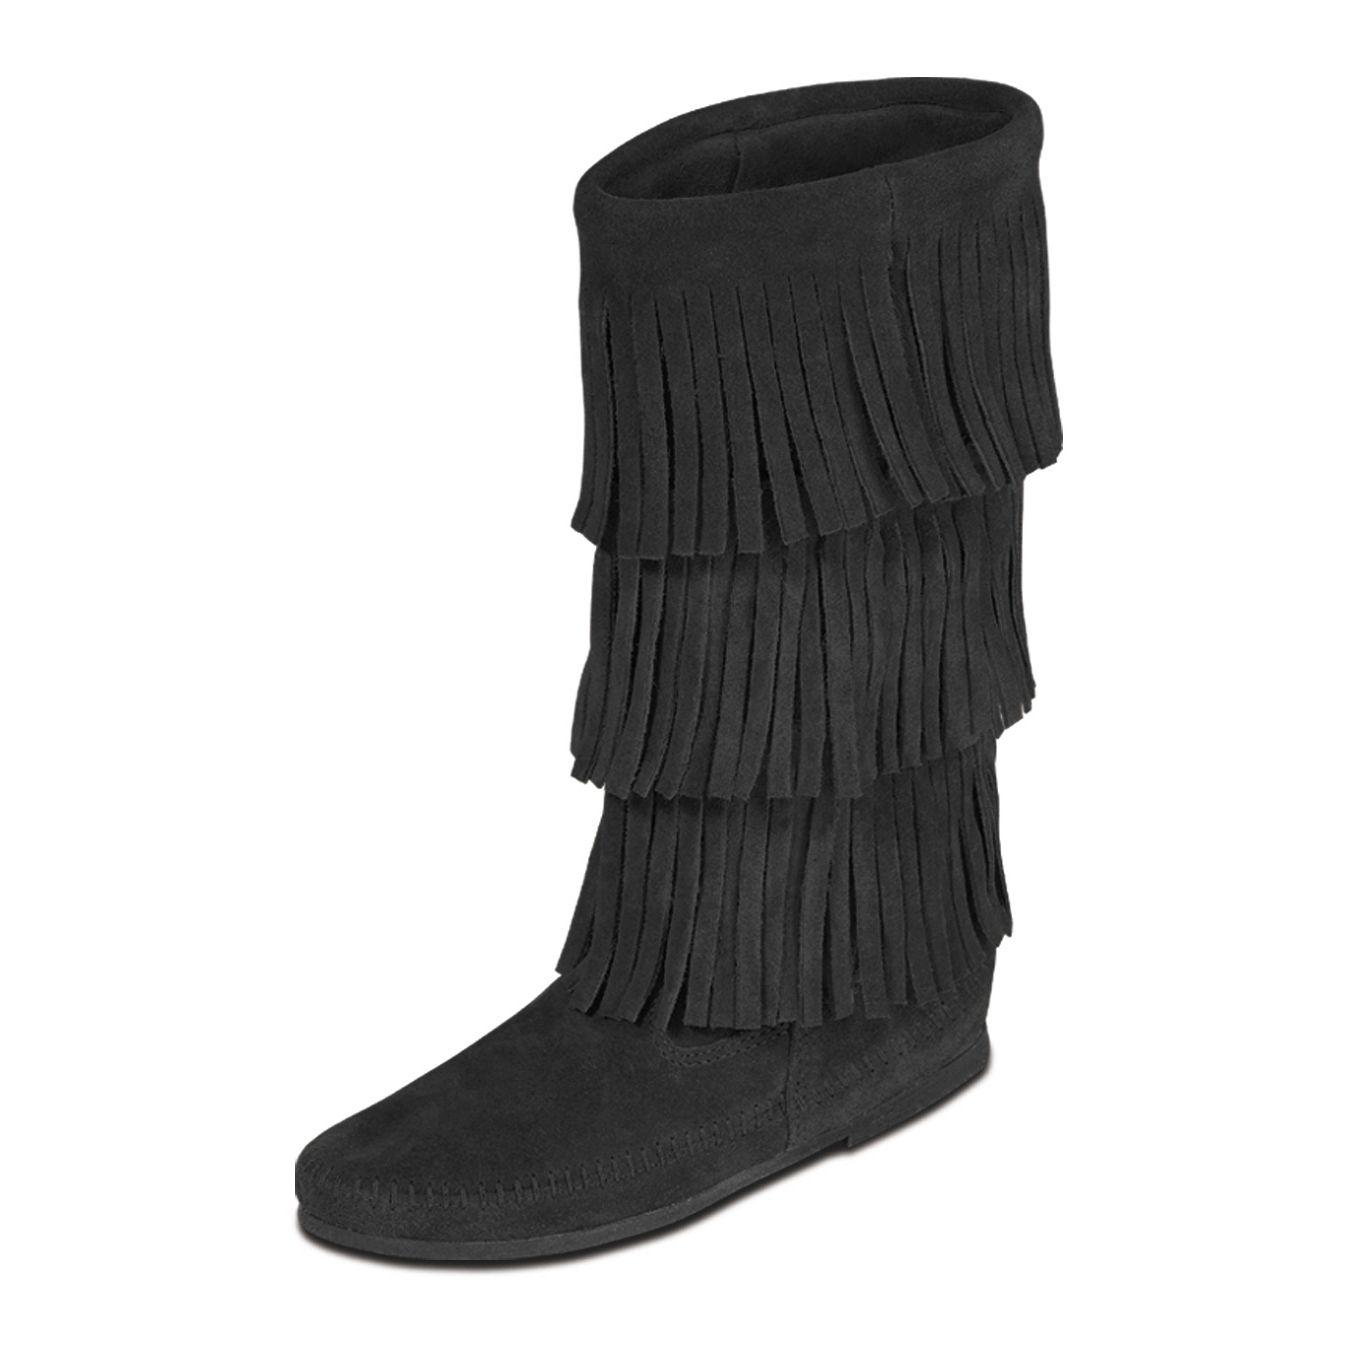 Minnetonka 3-Layer Fringe Boot Black, Schuhe, Stiefel & Stiefeletten, Hohe Stiefel, Schwarz, Female, 36